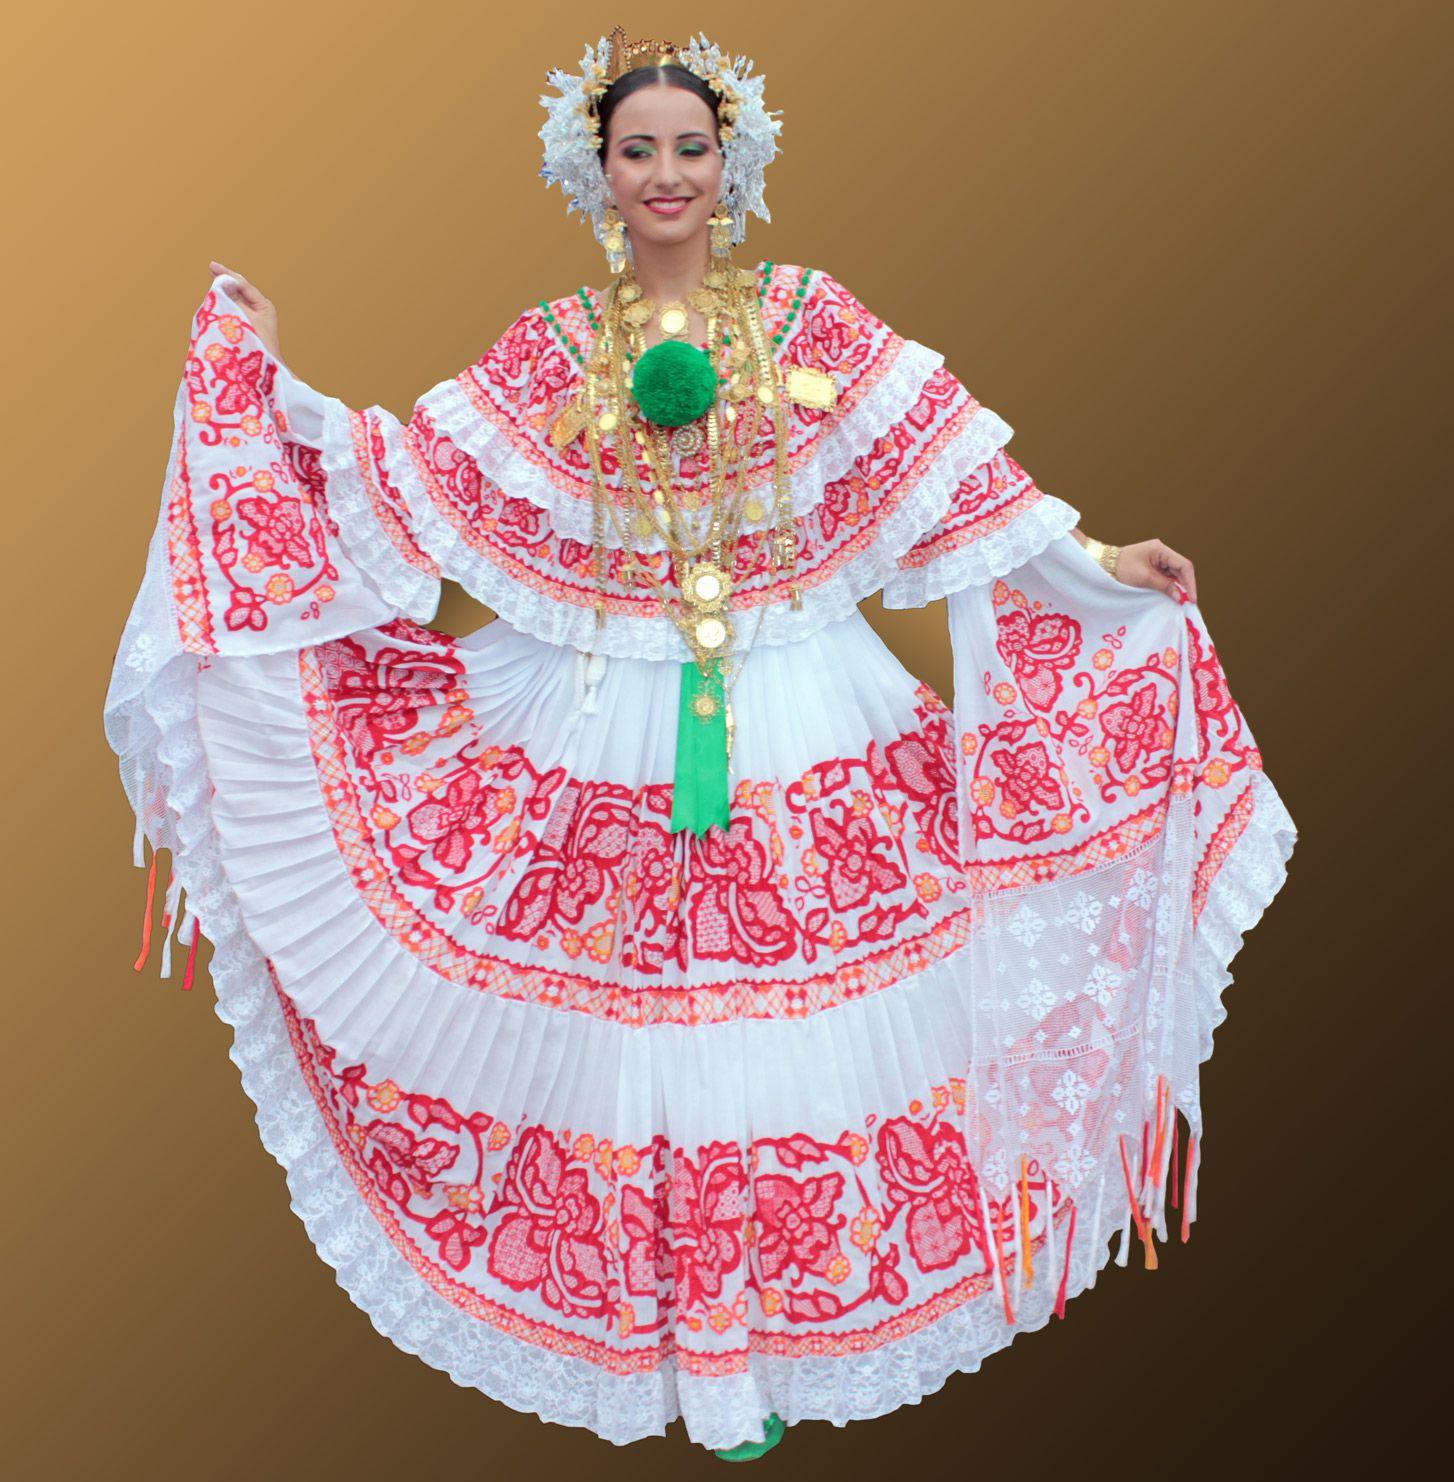 Pollera, Panama | Panama Culture | Panama, Traditional ...